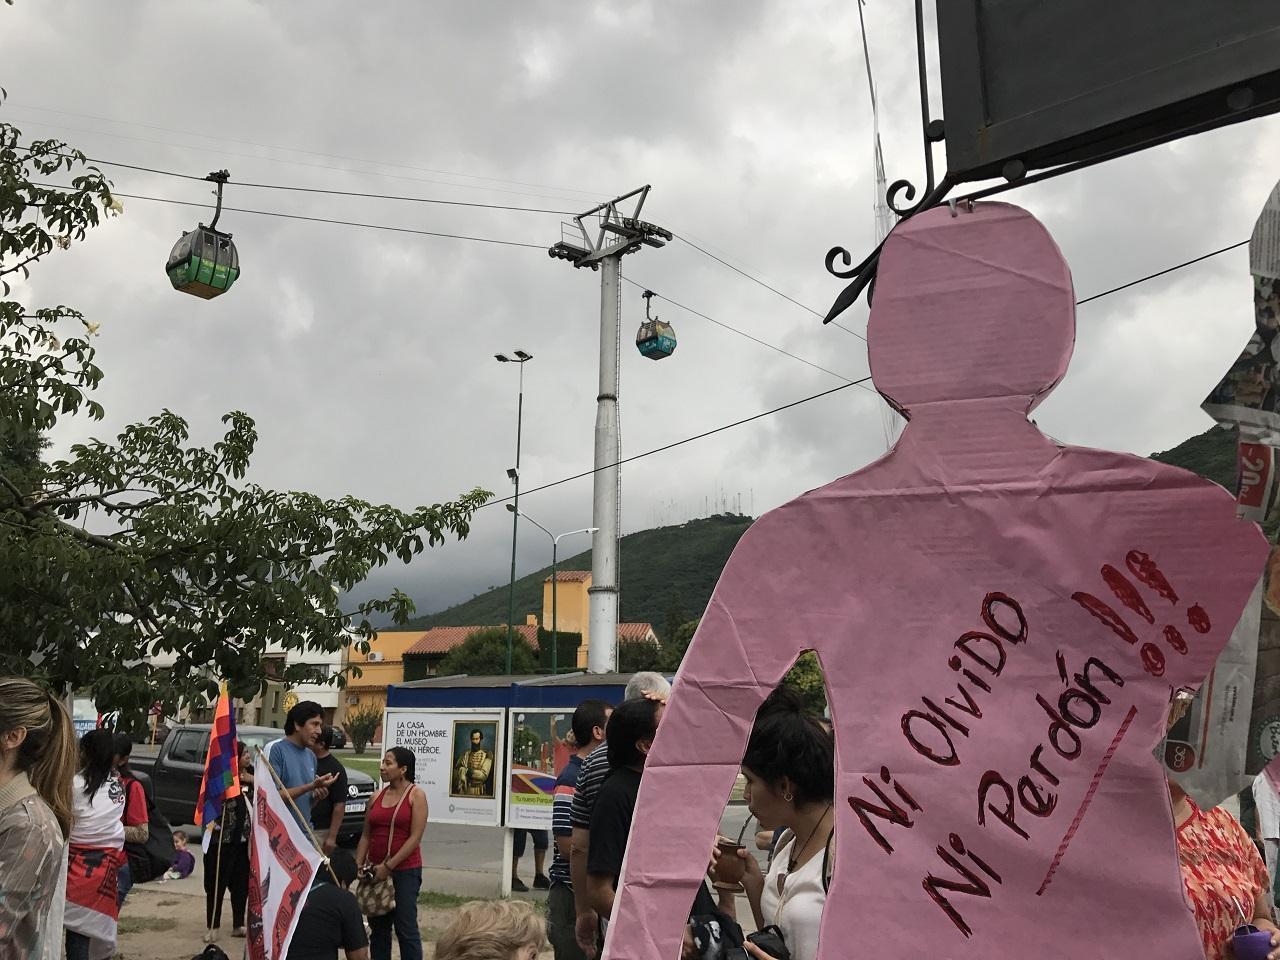 Abuelas de Plaza de Mayo anunciaron que encontraron a nieta 126